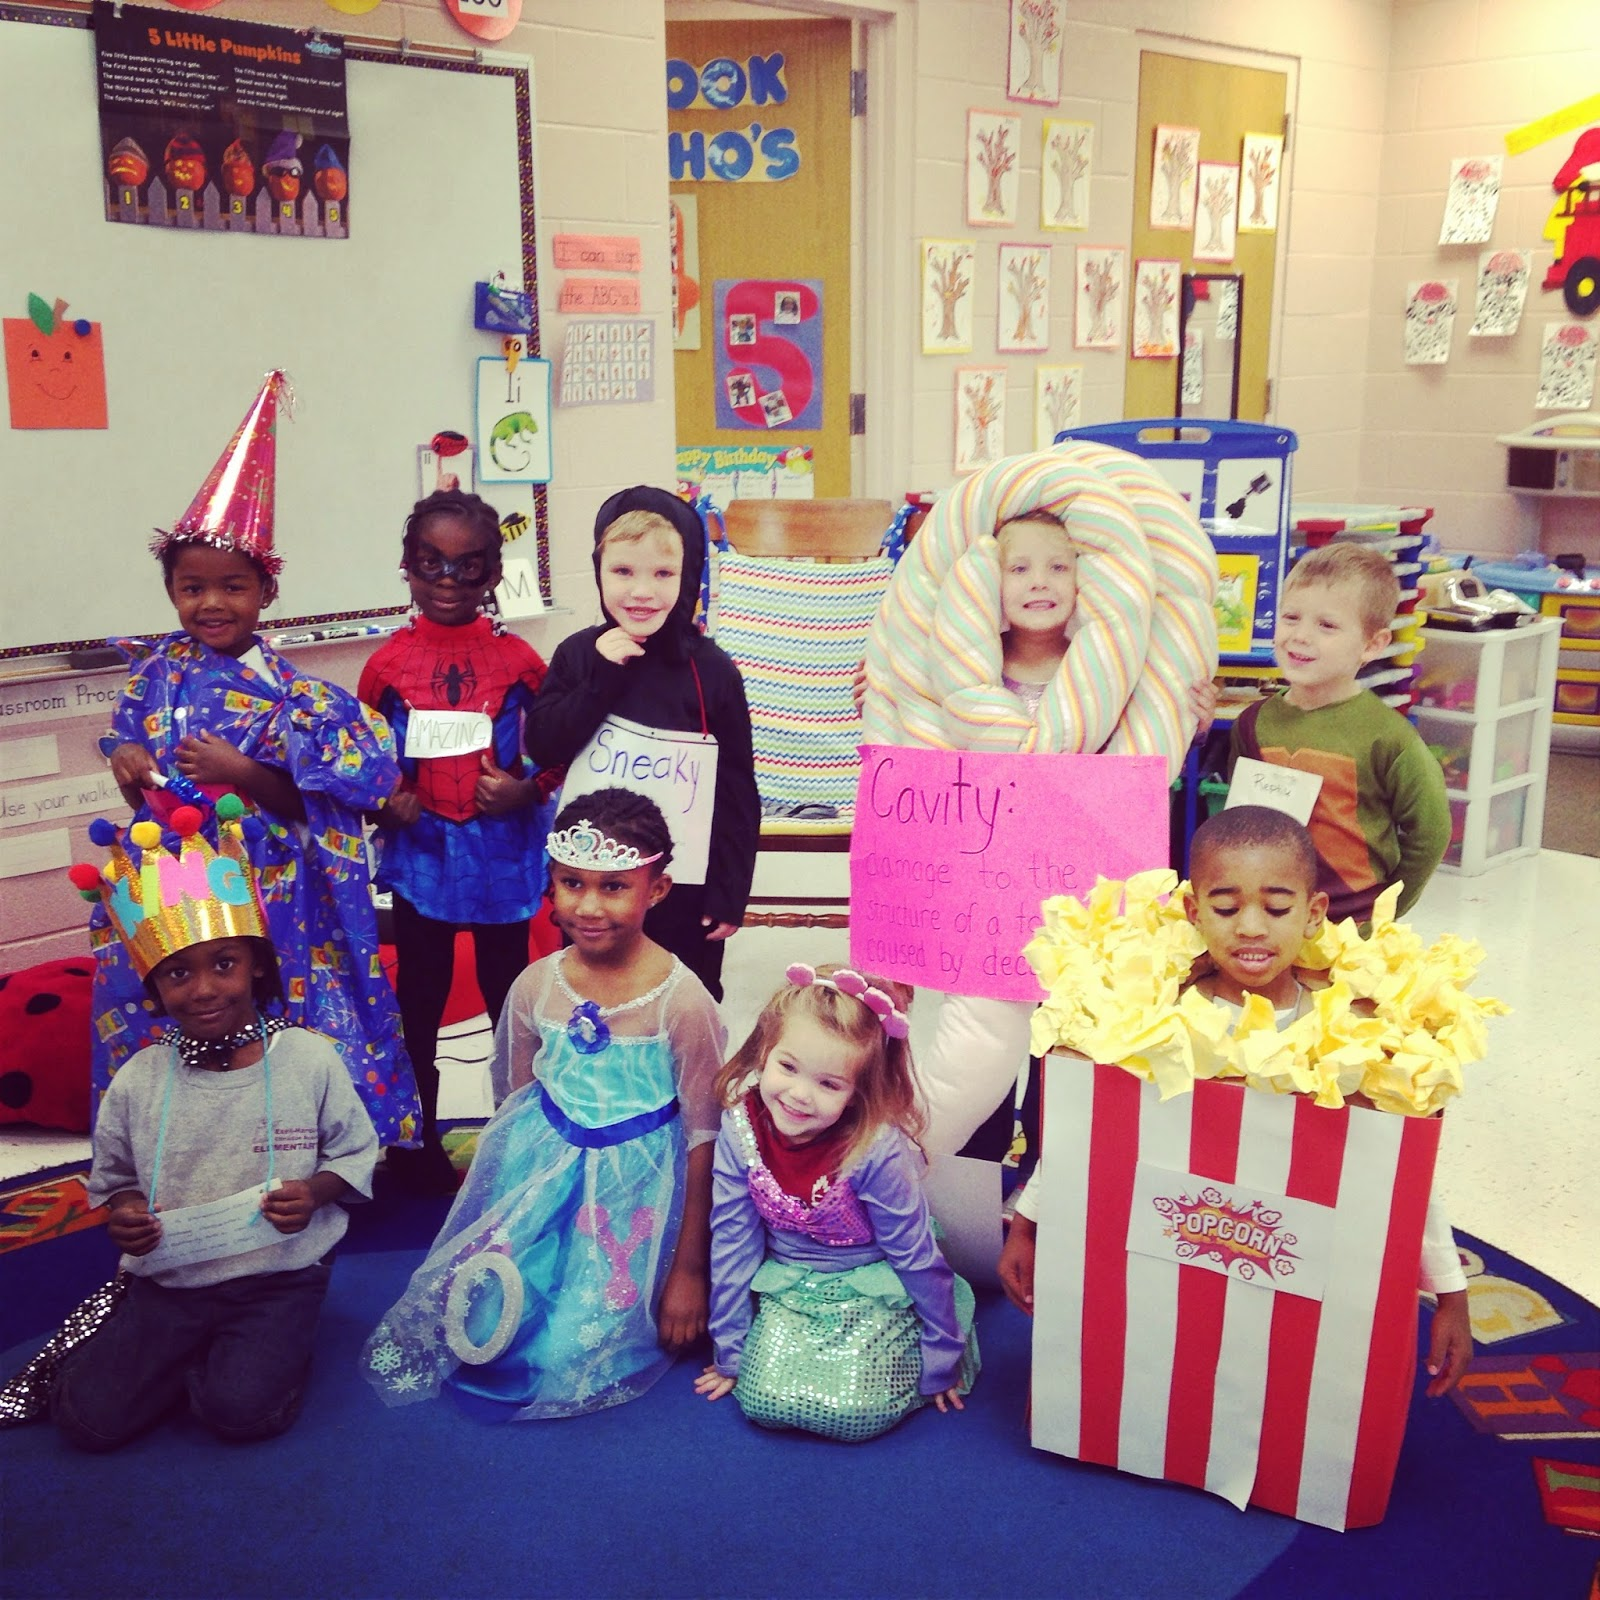 James Harden Elementary School: Ezell-Harding Elementary School: Vocabulary Parade